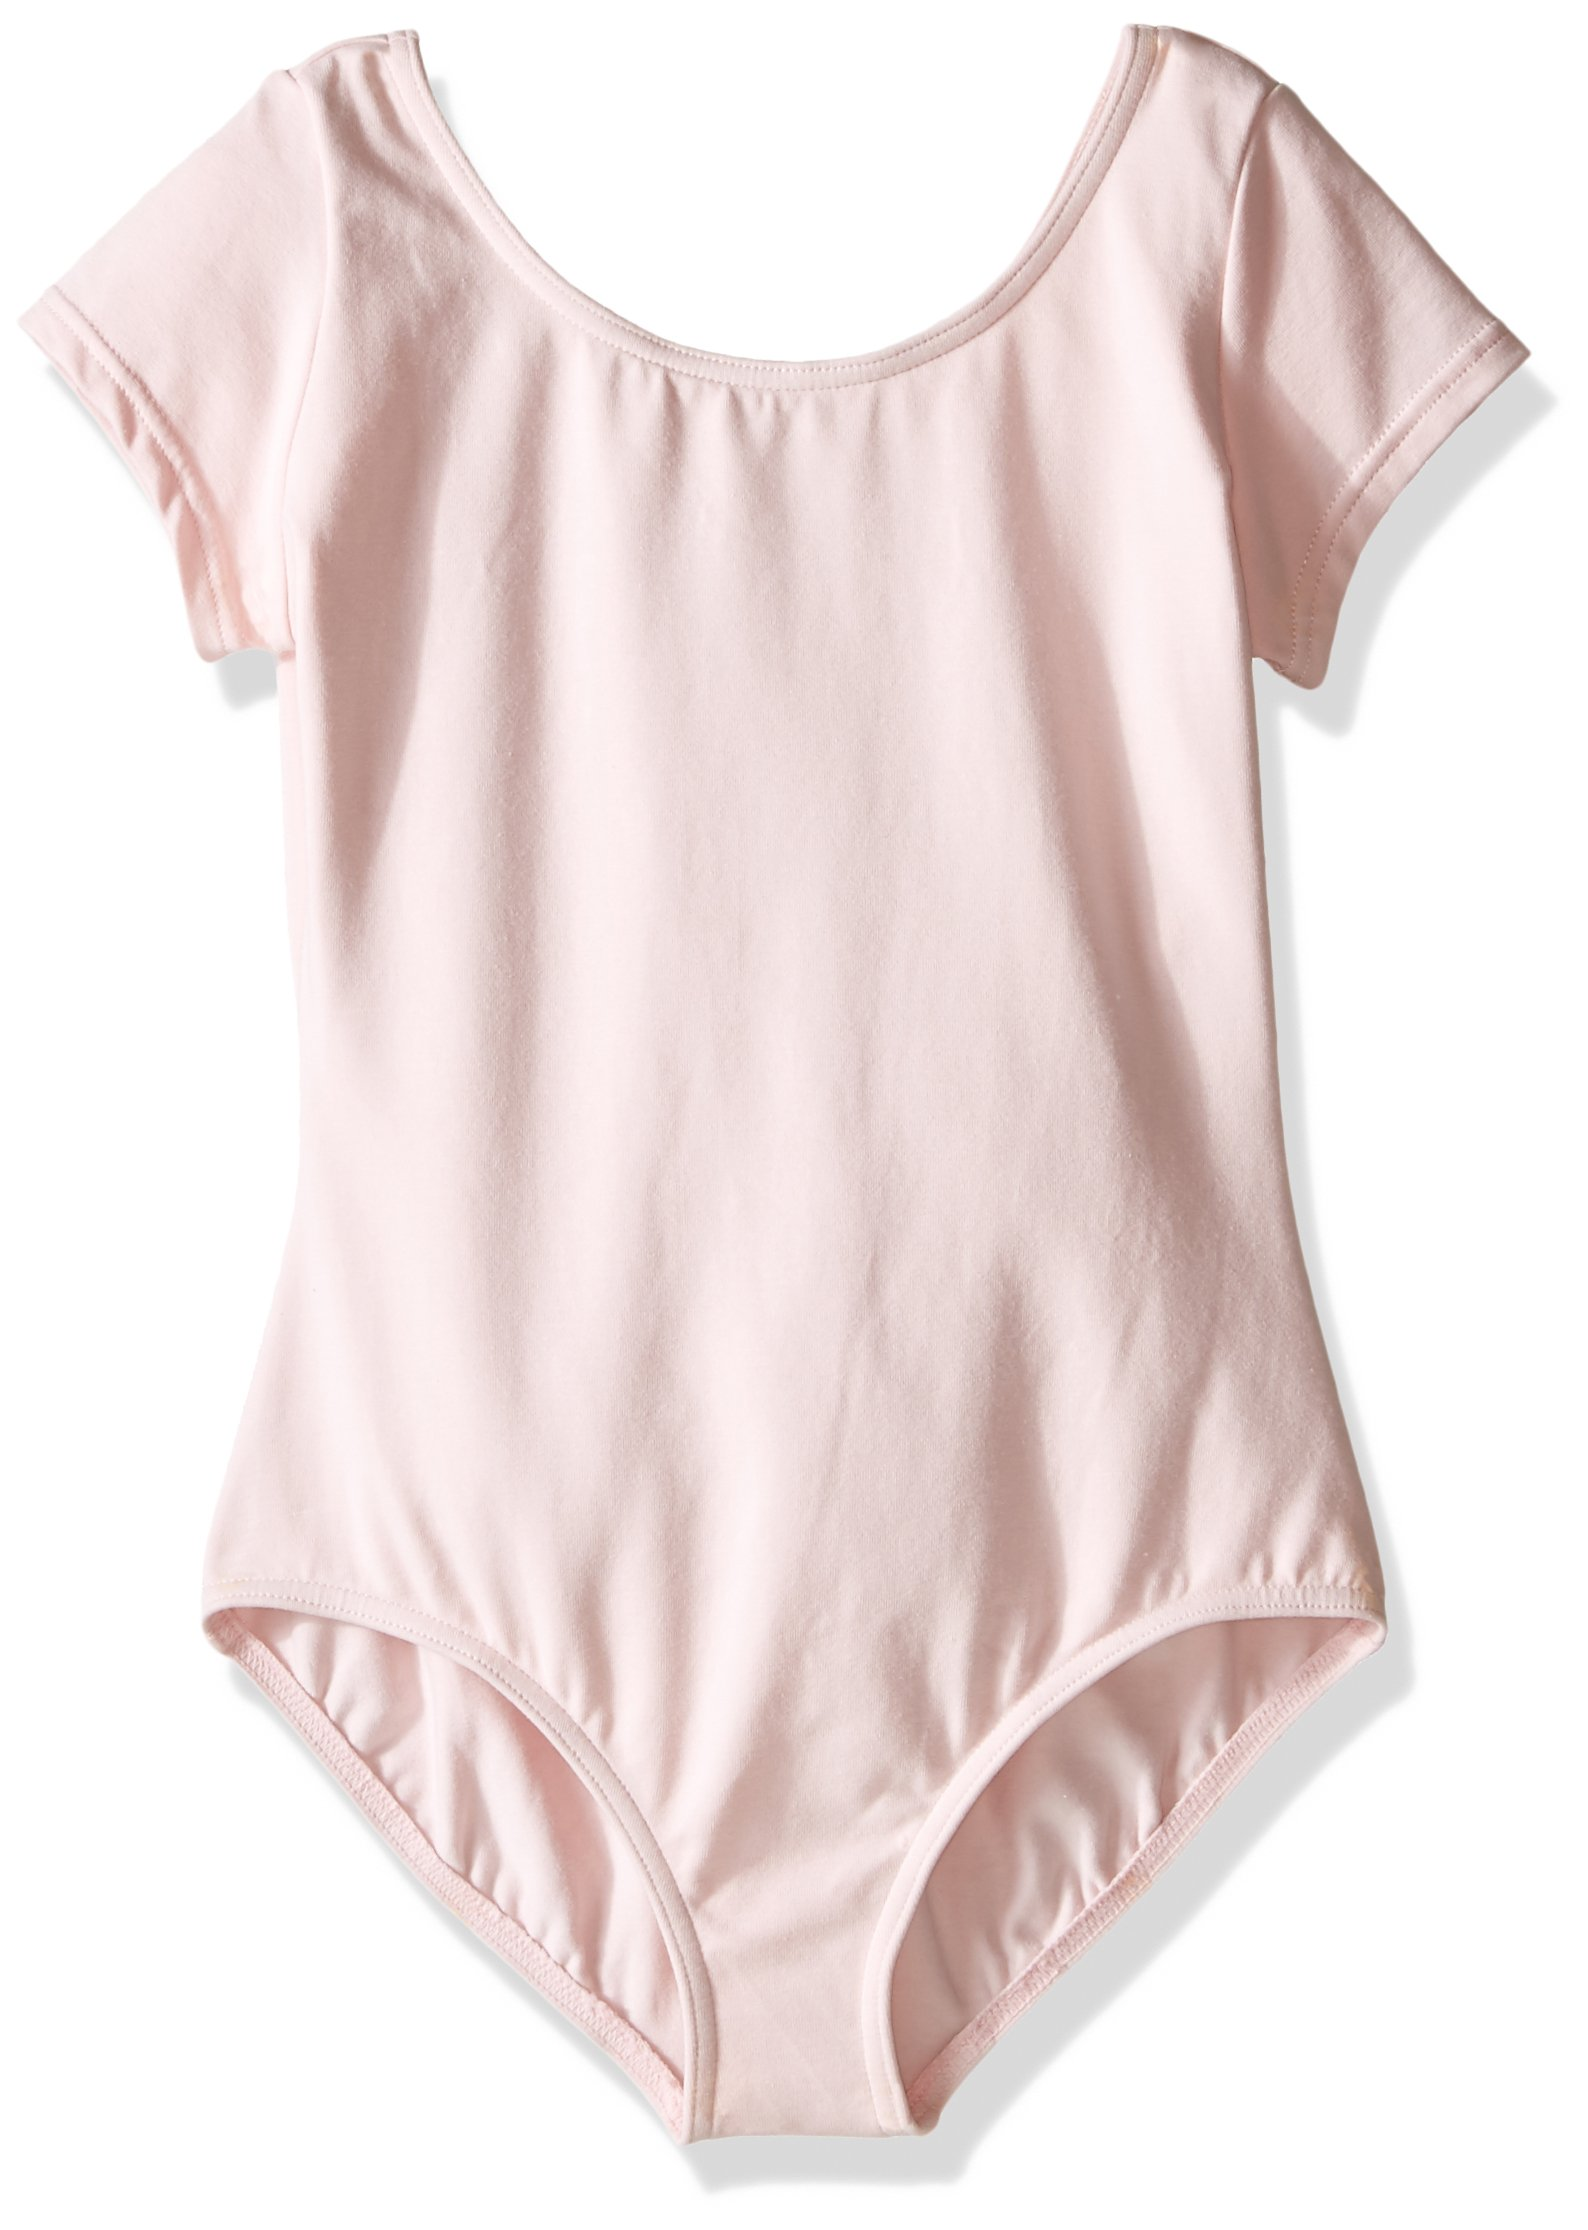 Capezio Little Girls' Classic Short Sleeve Leotard,Pink,T (2-4)